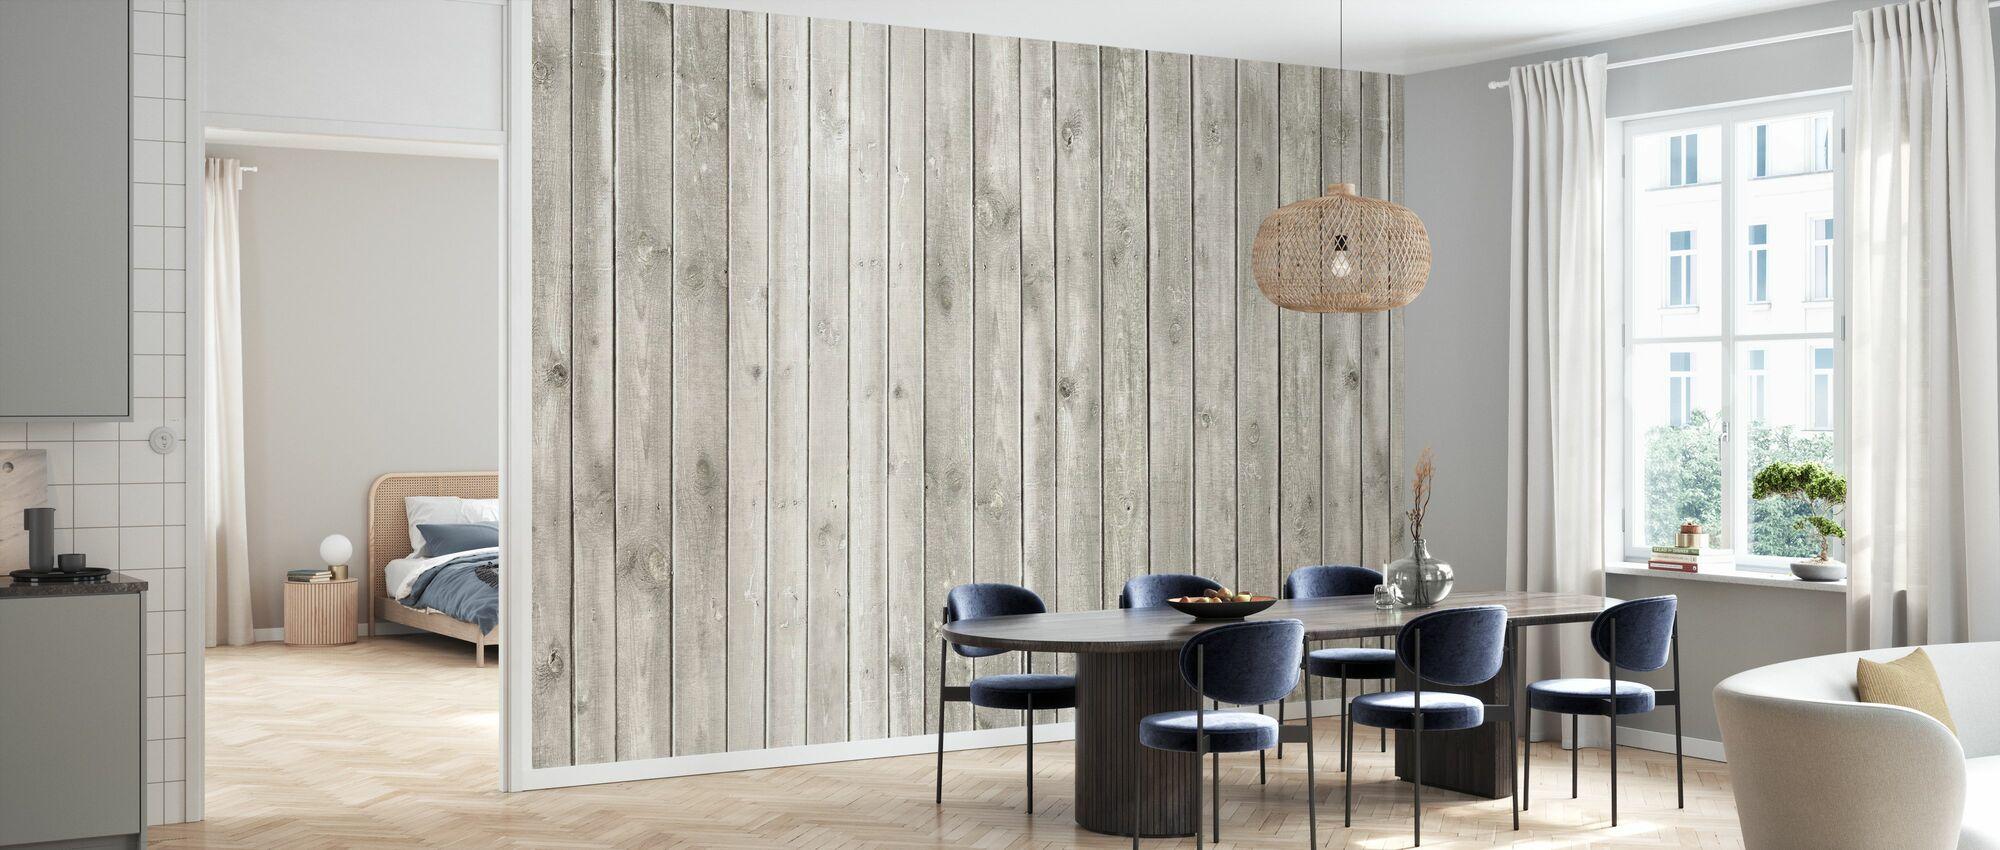 Faded Natural Wood - Wallpaper - Kitchen